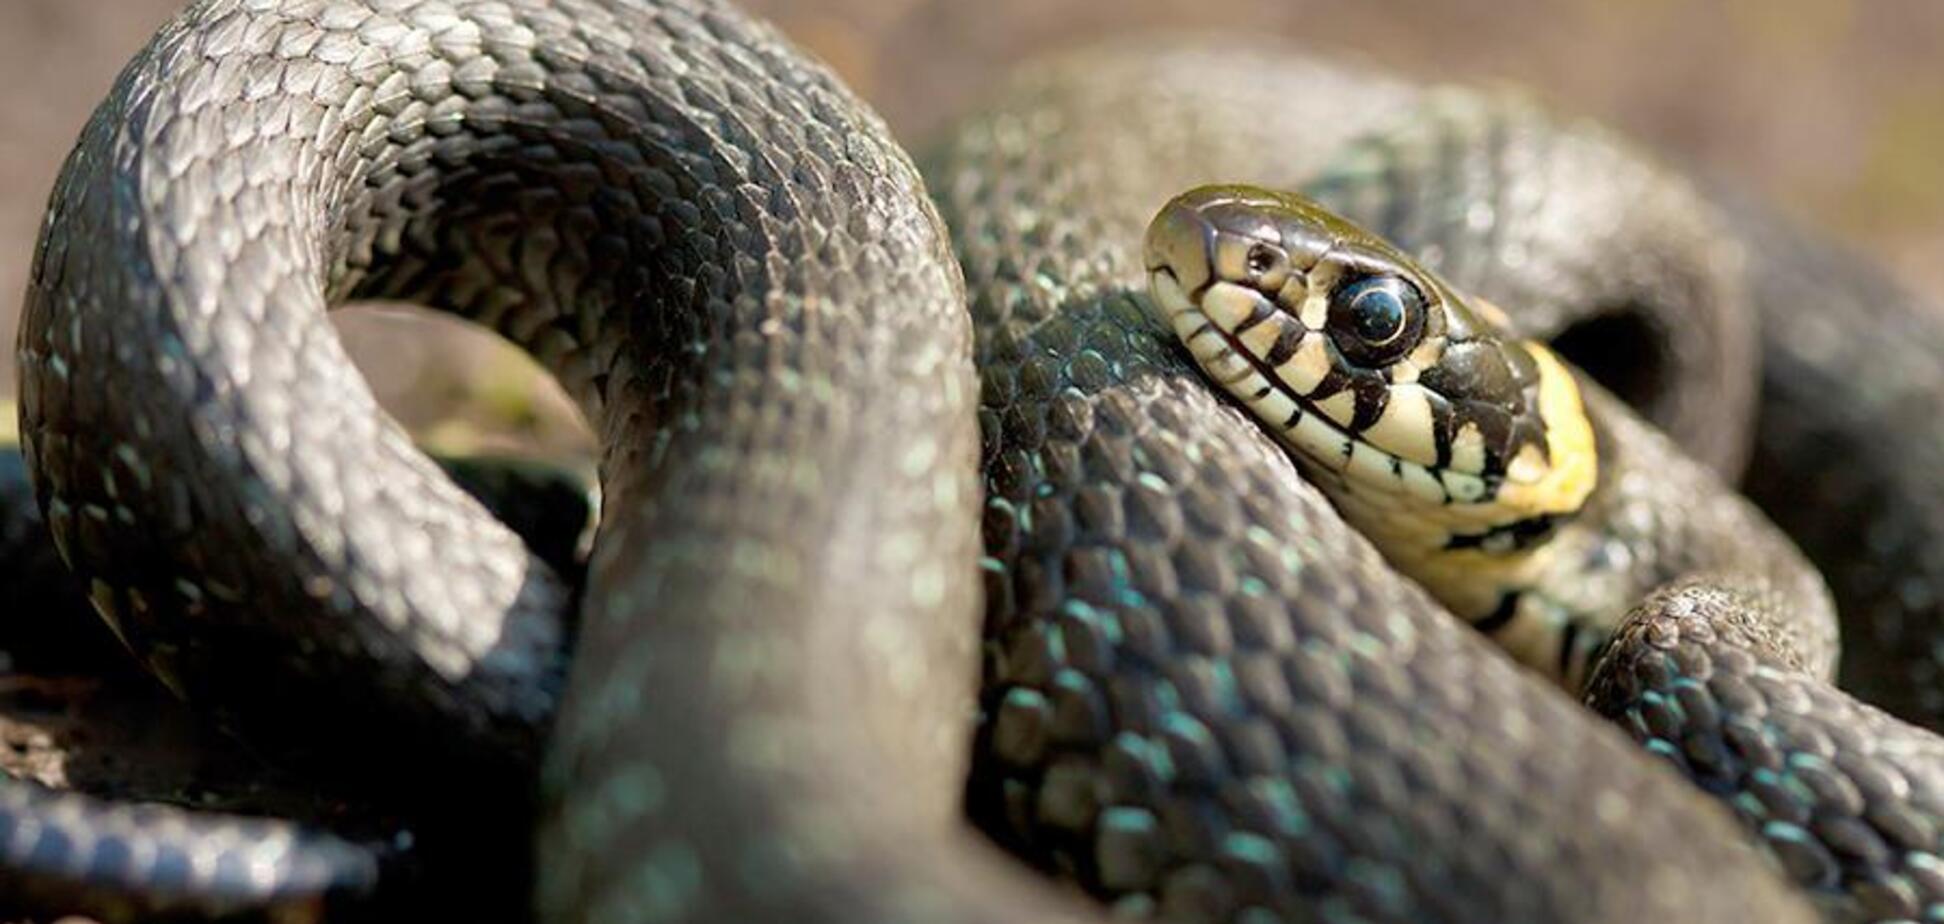 В Днепре в частном доме поймали 1,5-метровую змею. Фото и видео